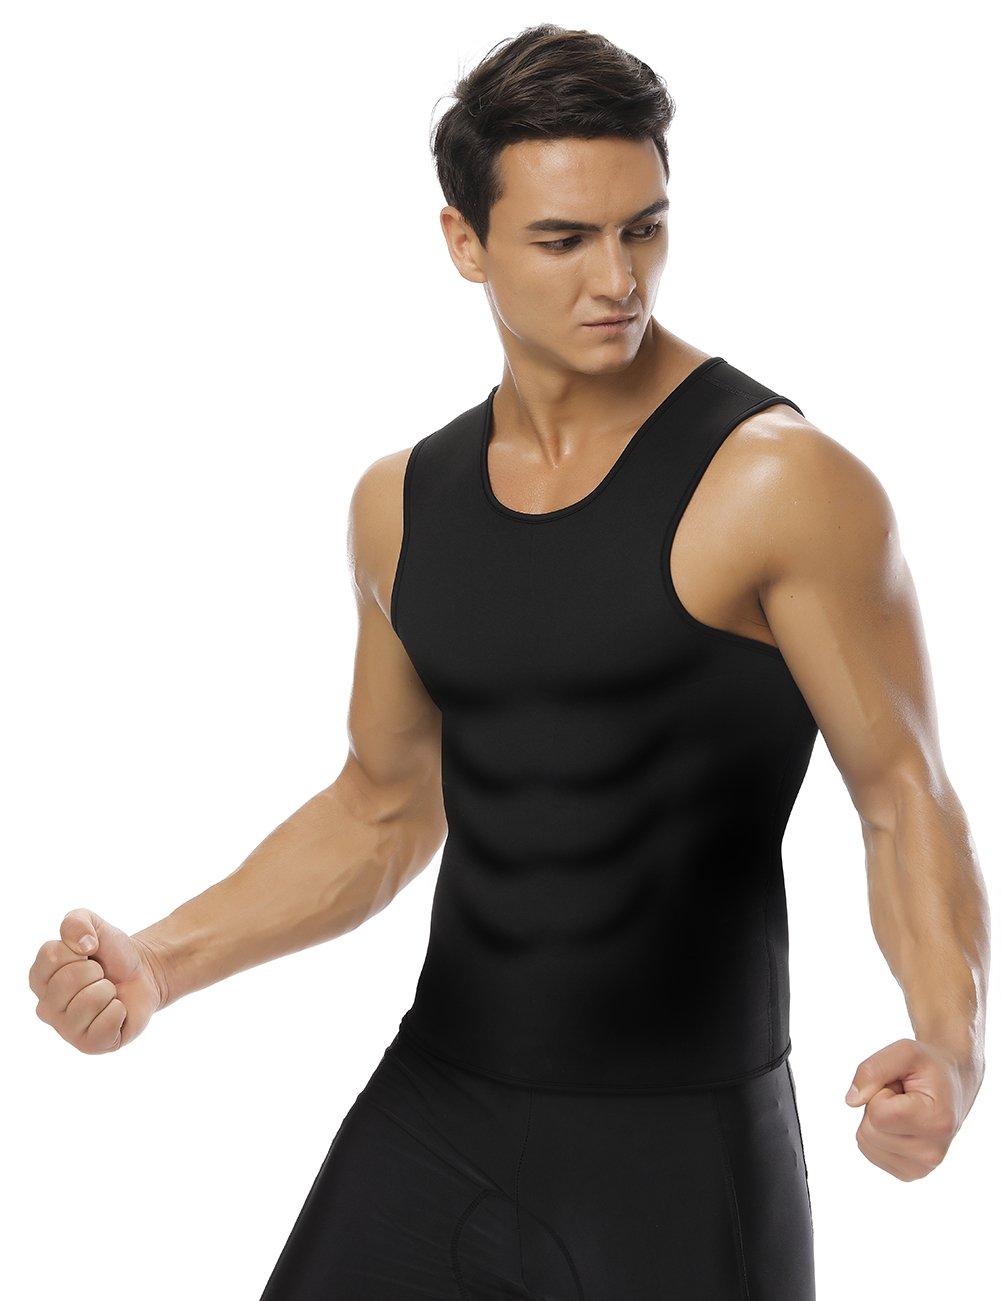 HEXIN Herren Slimming Sauna Shirt Sweat Weste Neopren Body Shaper Tank Top Gewicht Verlust Kein Rei/ßverschluss bleigeschossen X L Gr/ö/ße